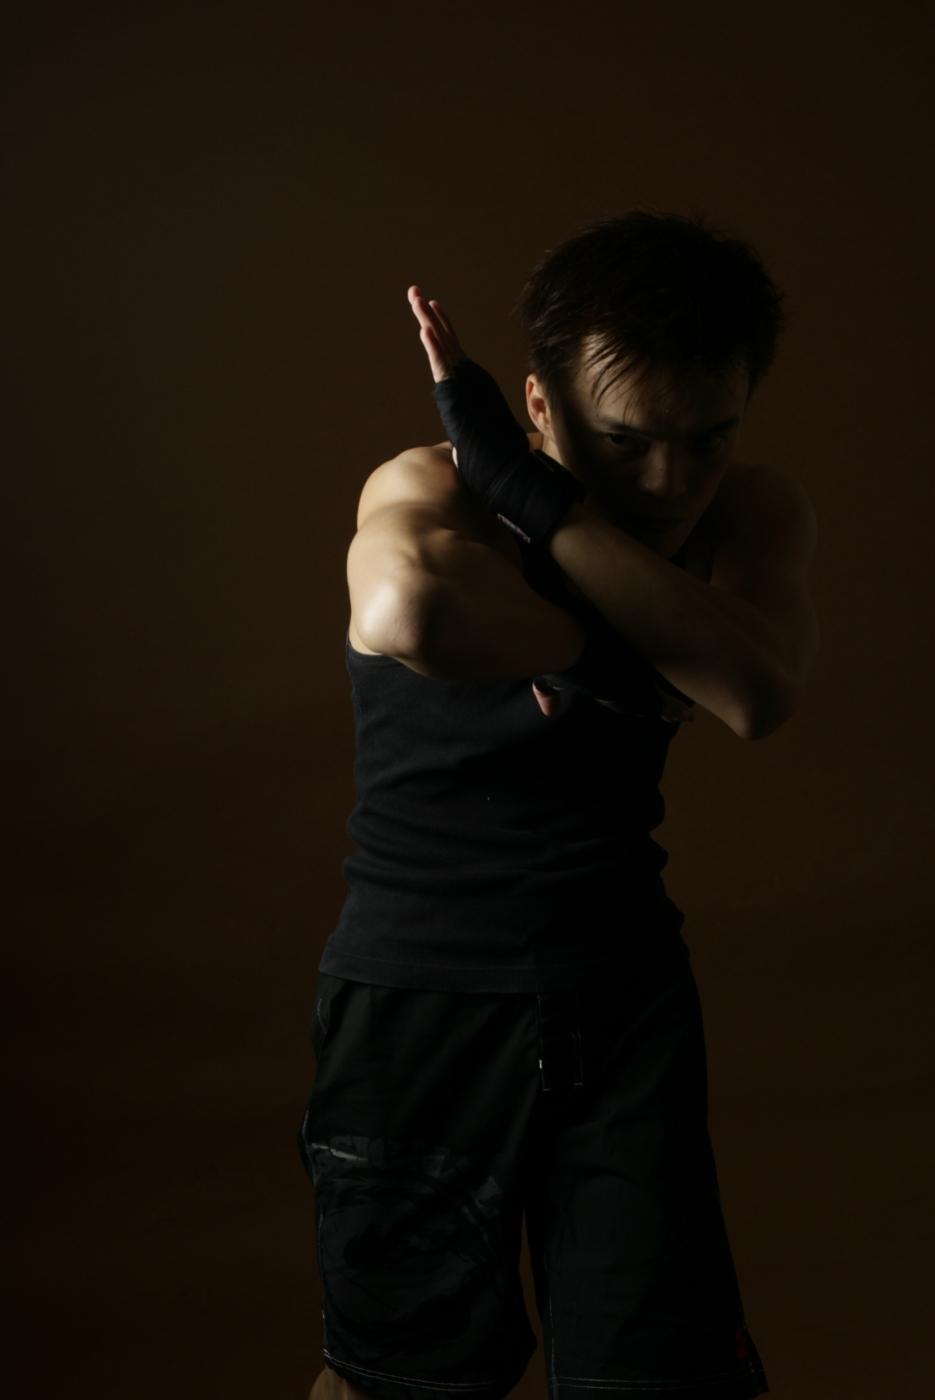 Chris Lim's picture